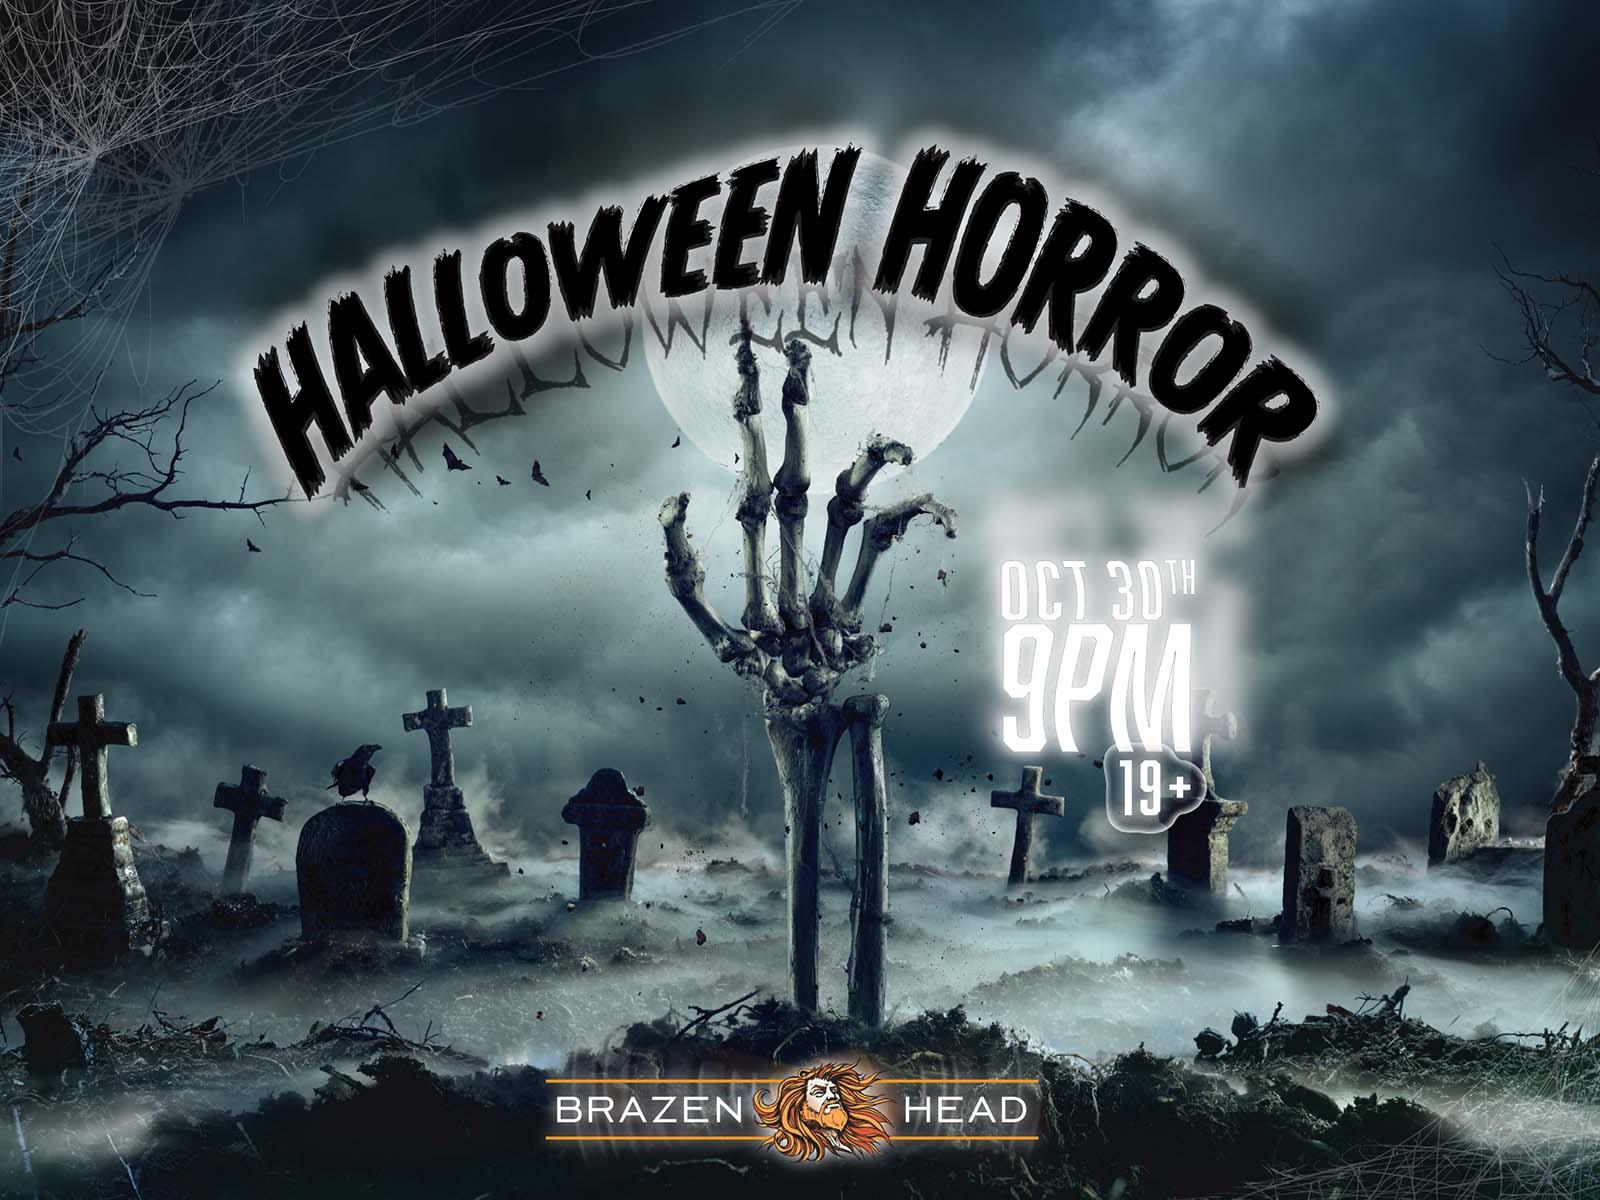 Halloween Horror Experience